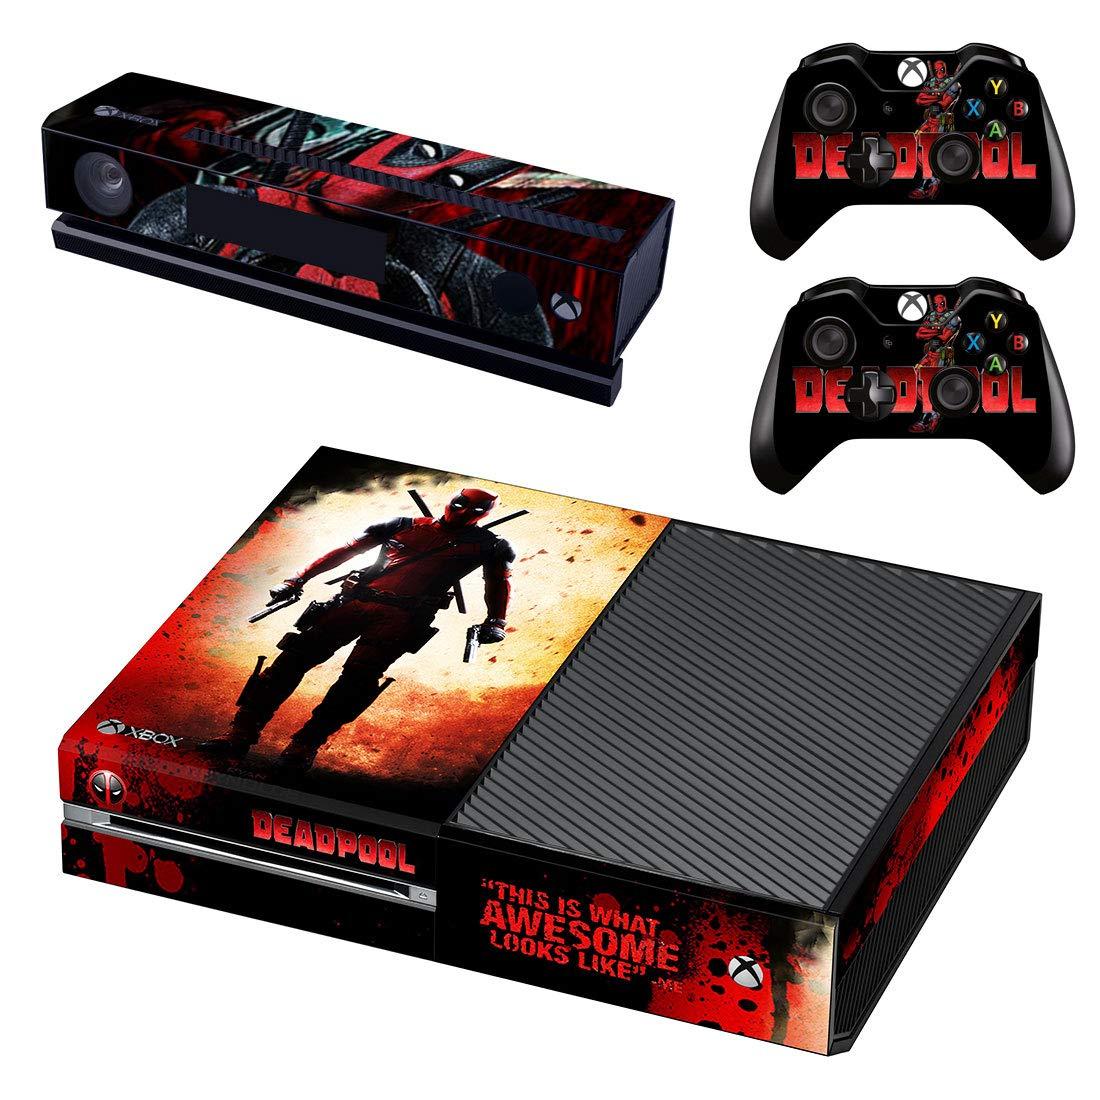 Adventure Games® - XBOX ONE ORIGINAL - Deadpool - Playstation 4 Vinyl Console Skin Decal Sticker + 2 Controller Skins Set